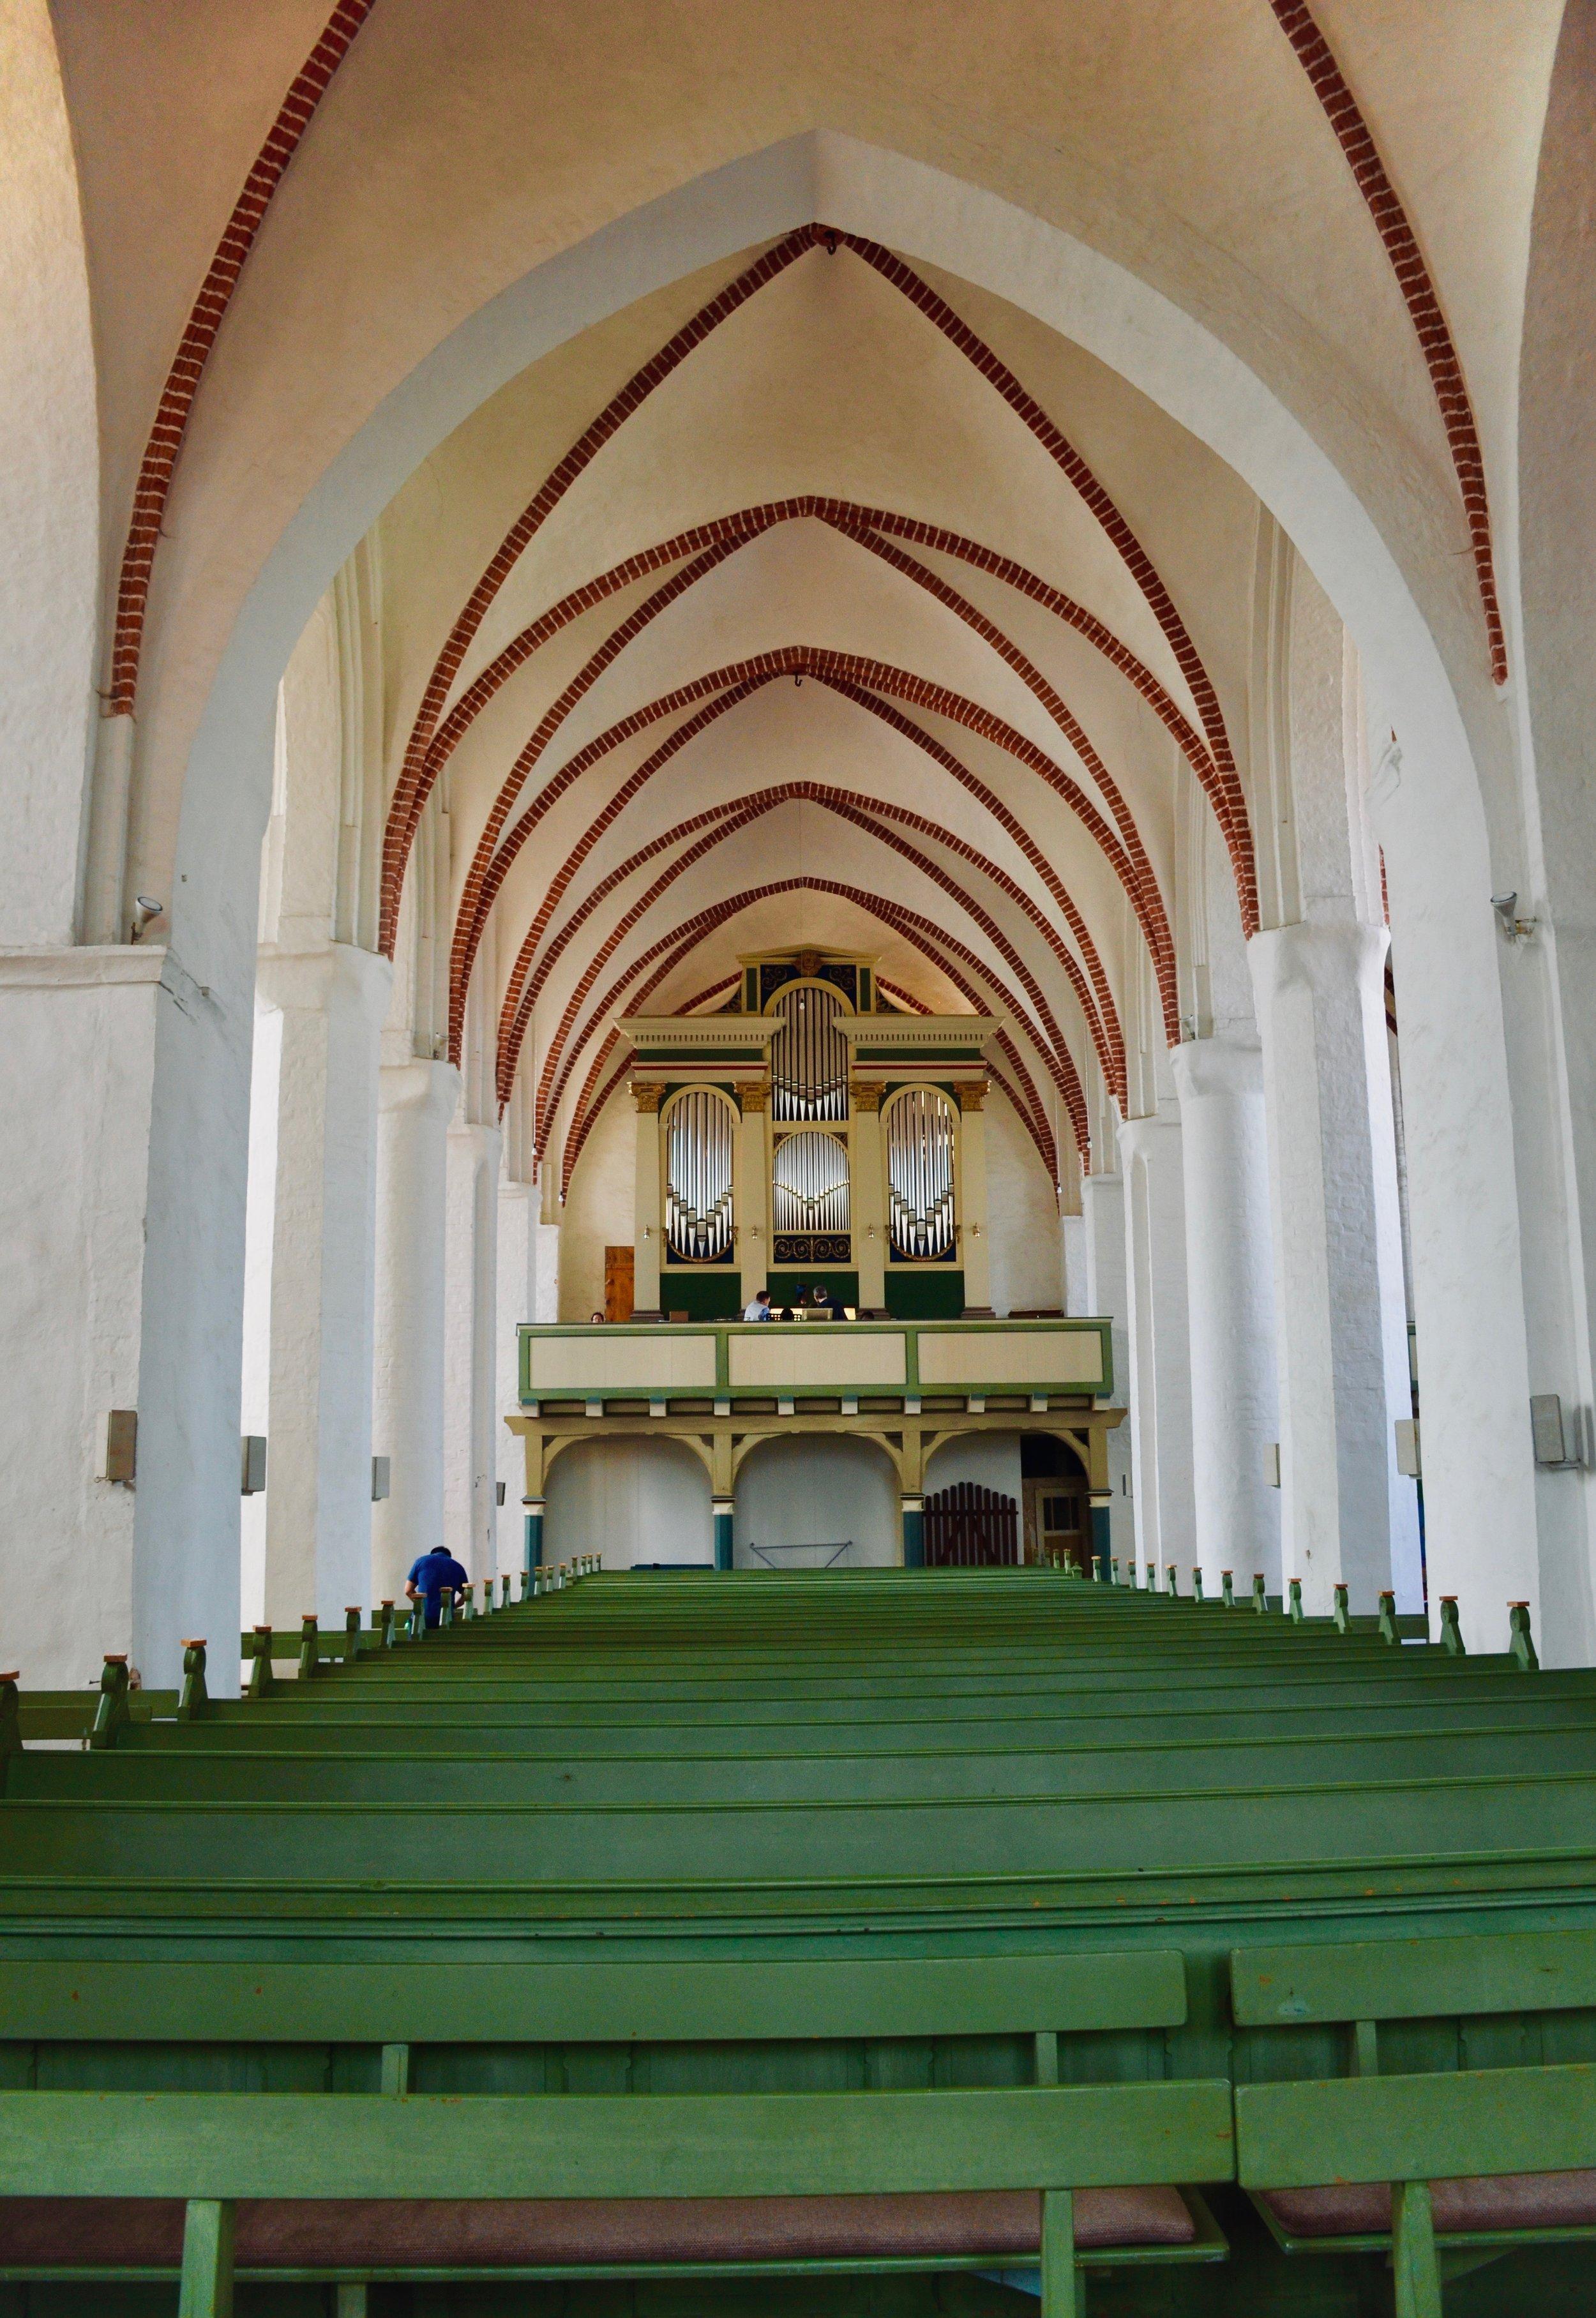 1825 Buchholz Organ in St. Nicolai-kirche, Osterburg.